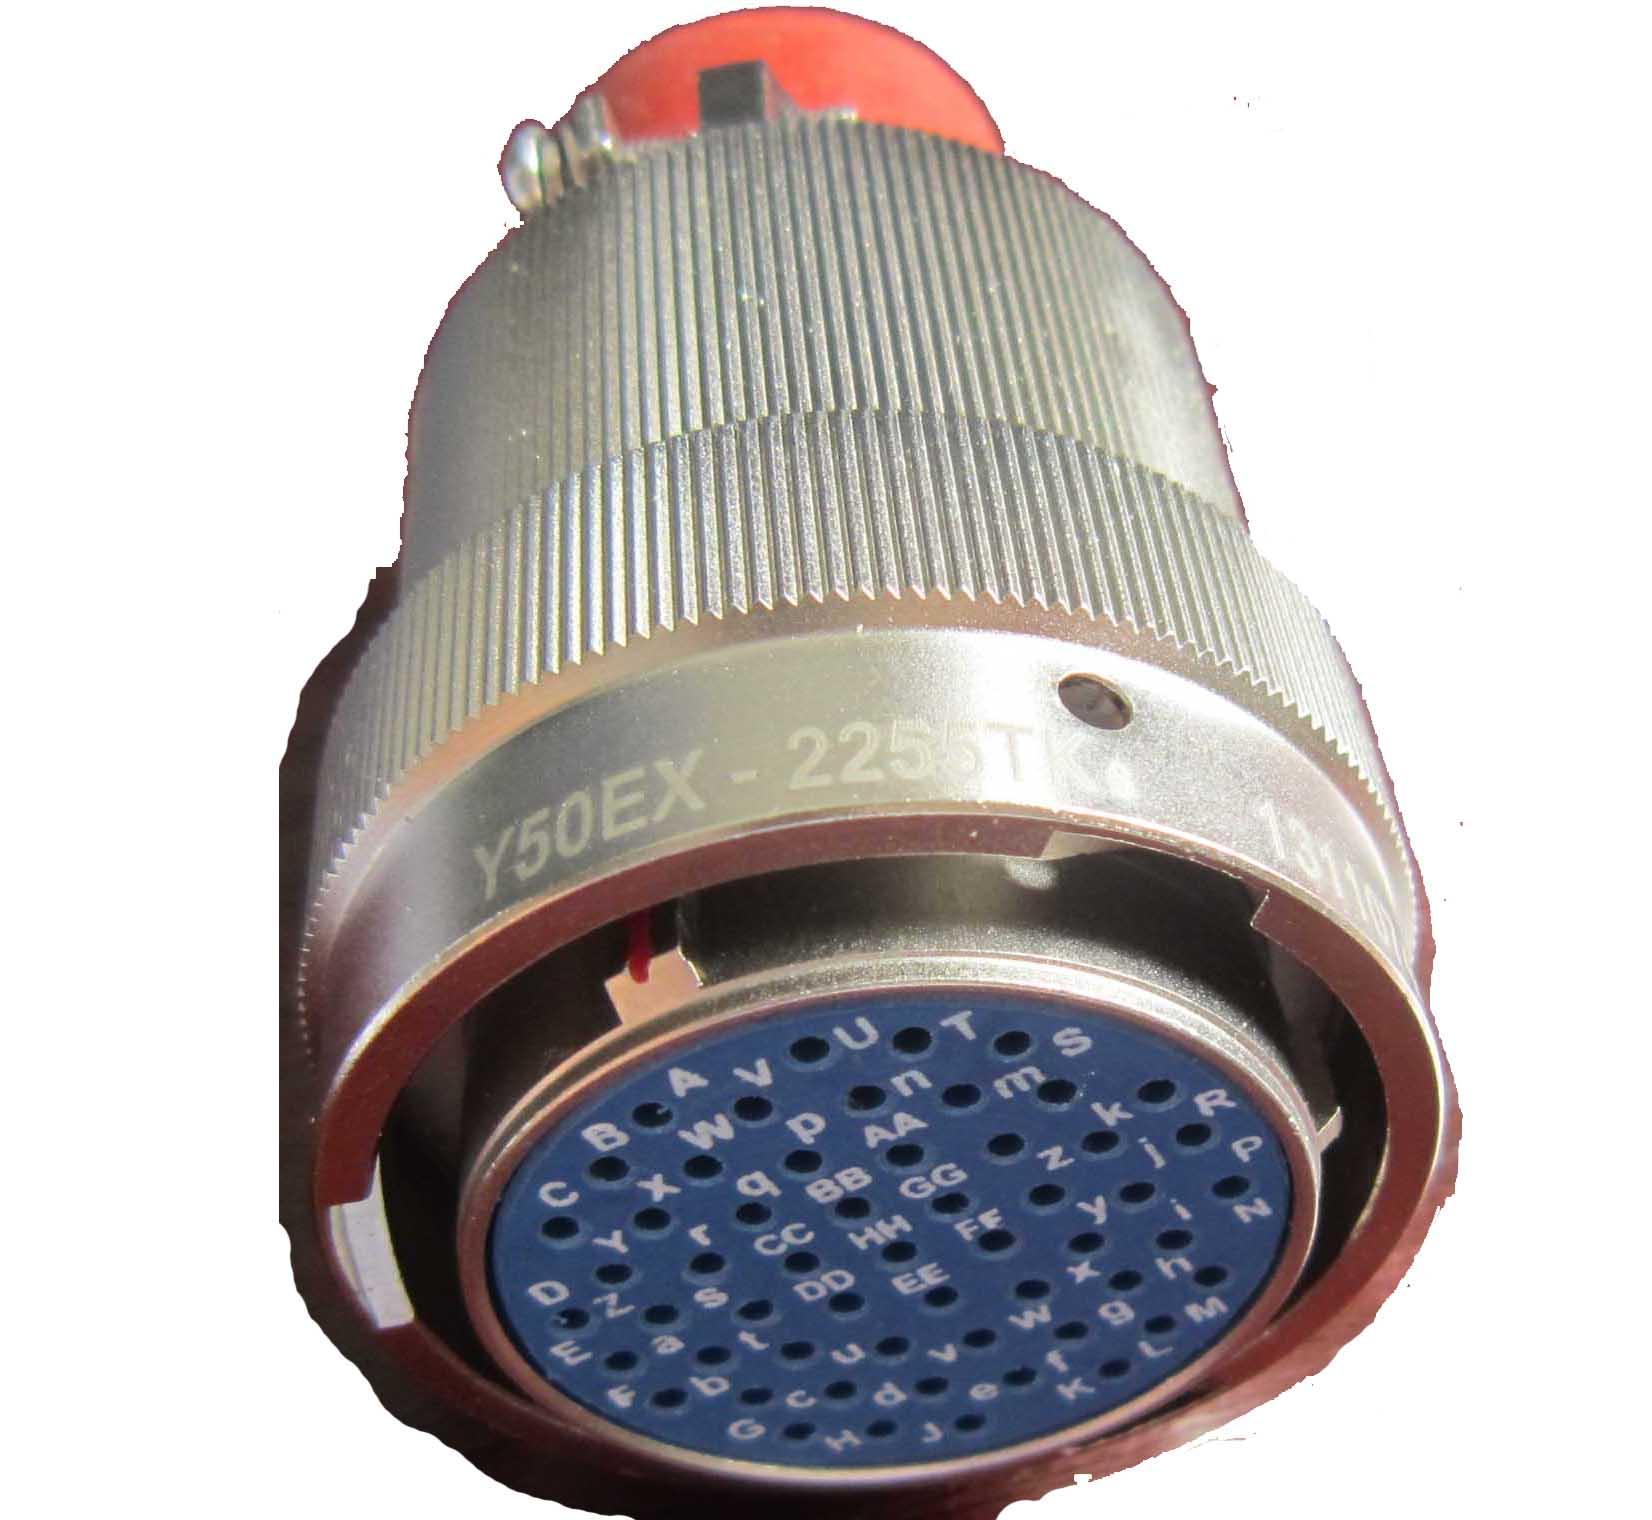 Y50EX-2255 item Circular connectors as MIL-C-26482 series